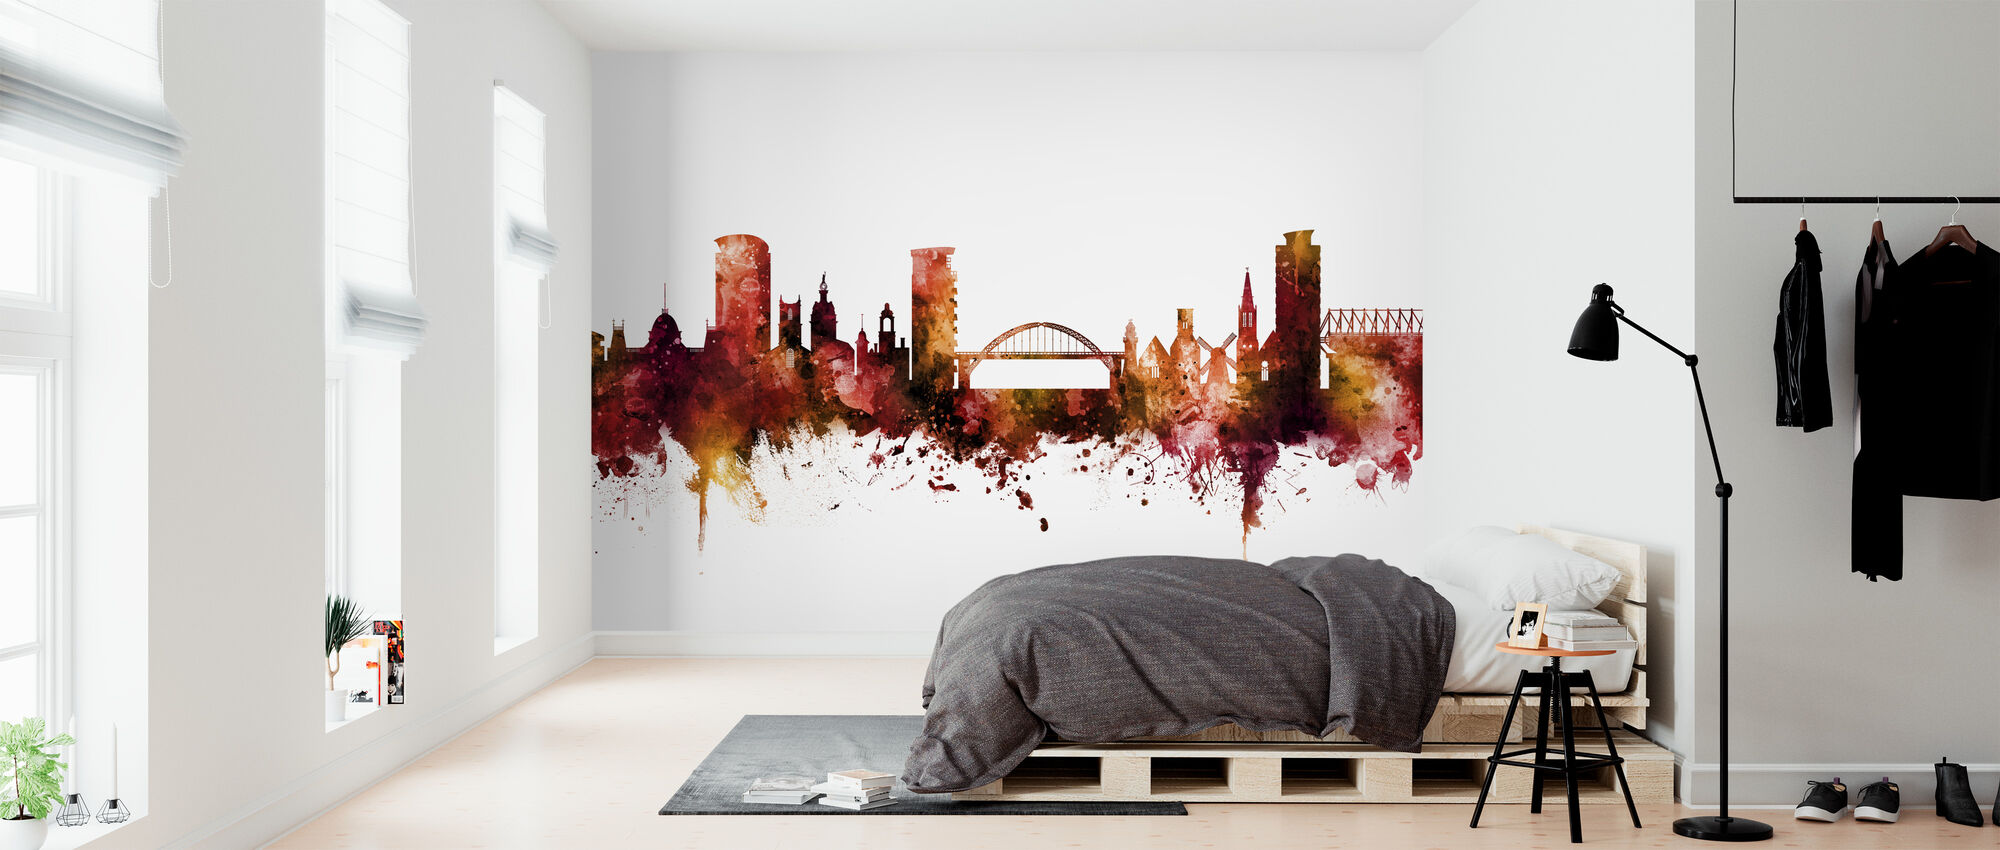 Sunderland England Skyline - Wallpaper - Bedroom